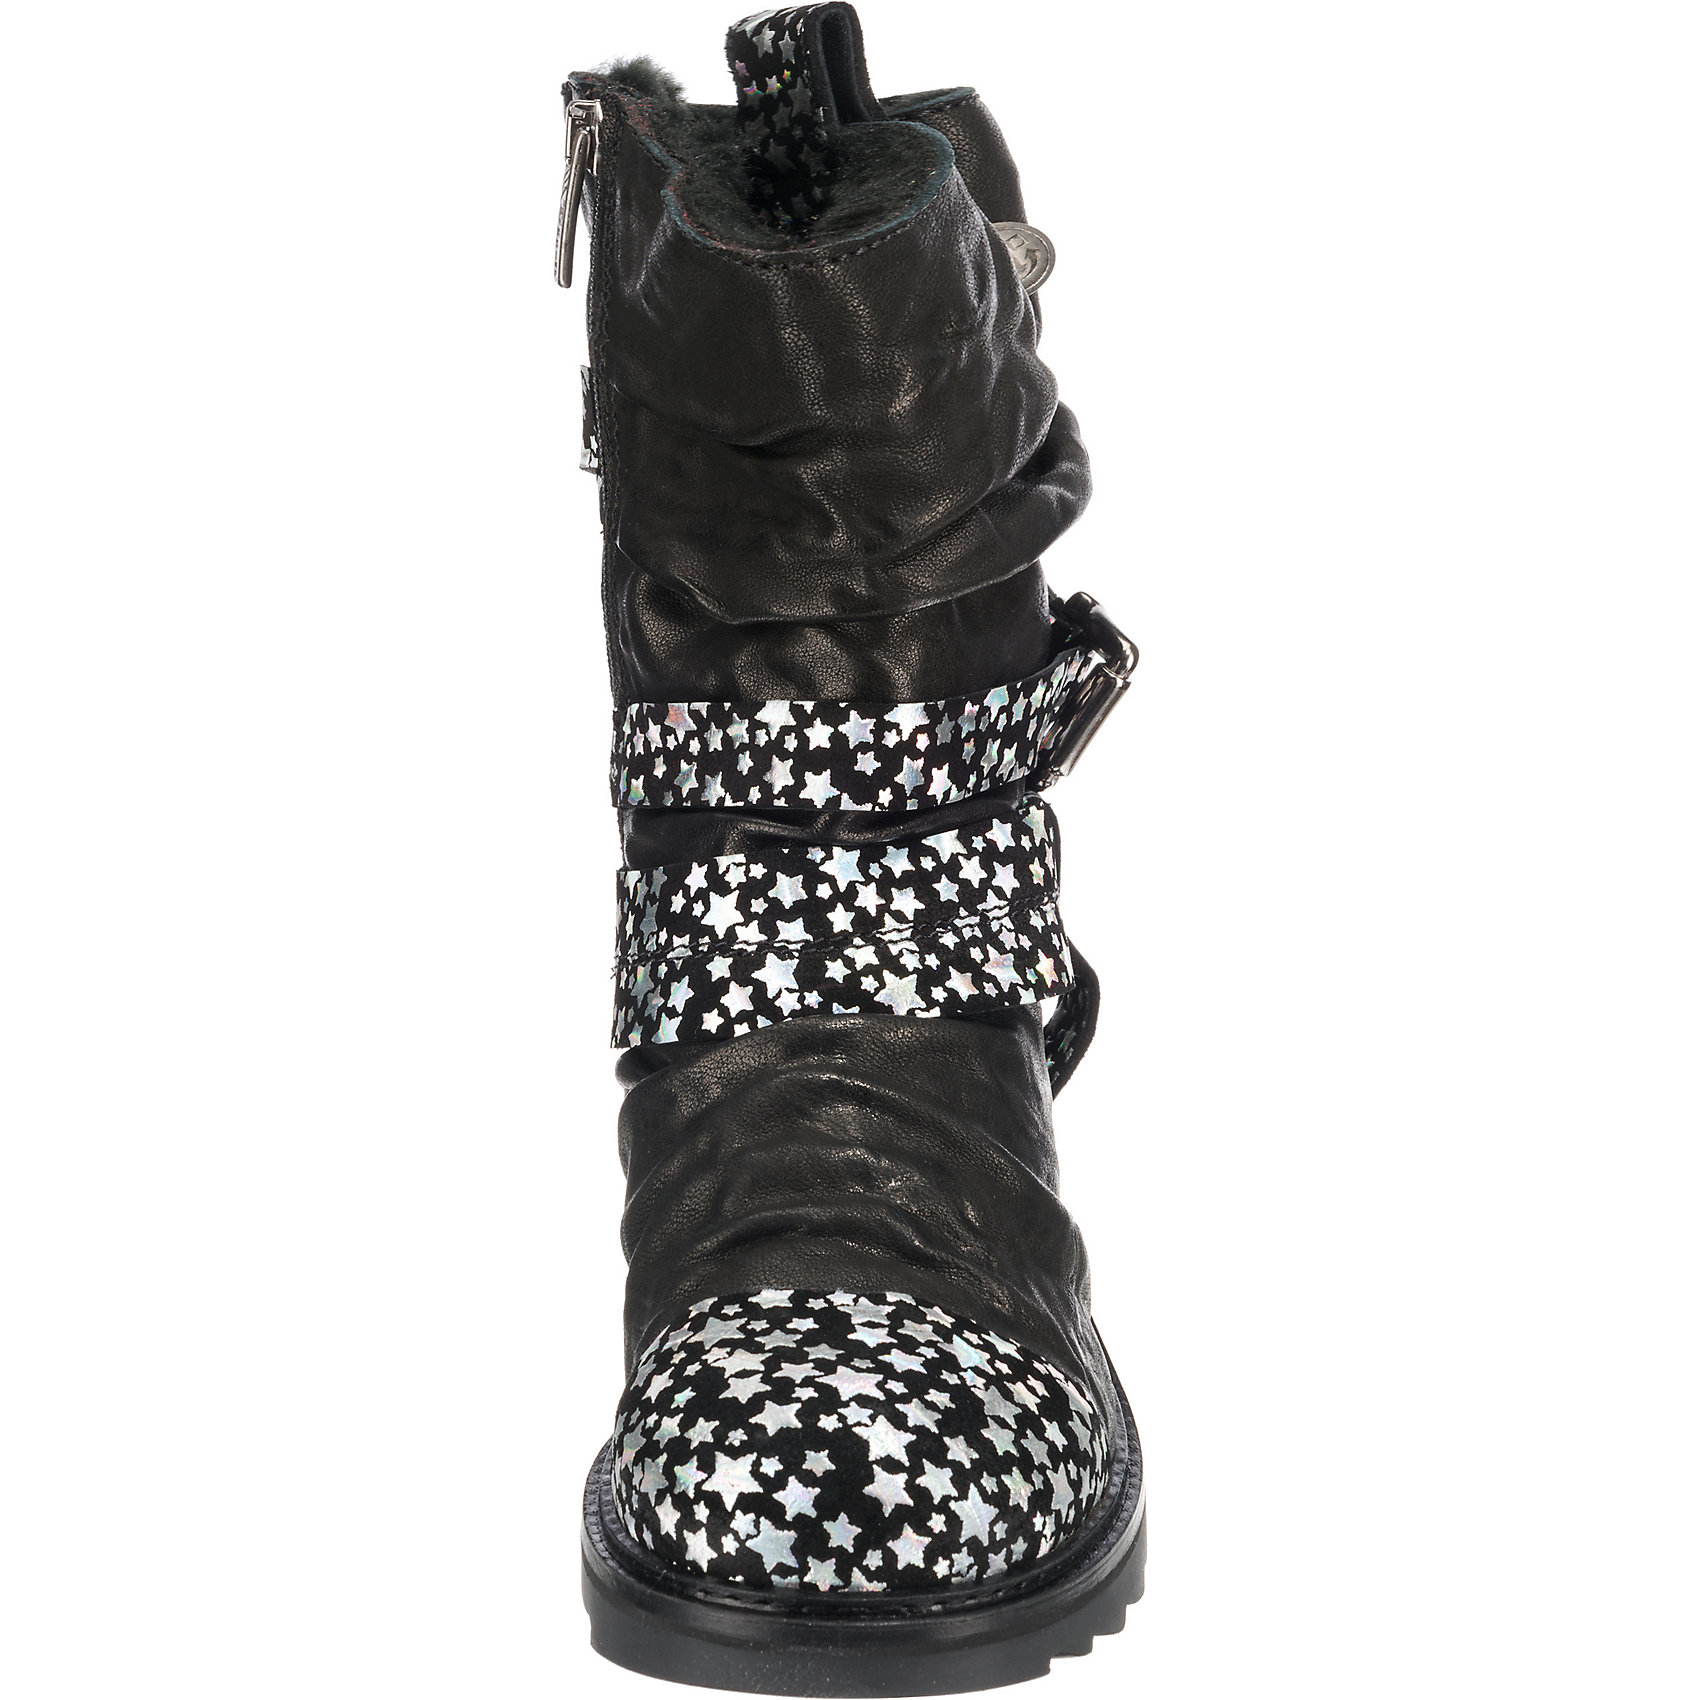 Neu Neu Neu Tiggers® Cora 01f Winterstiefel 8454785 für Damen schwarz 52b20c